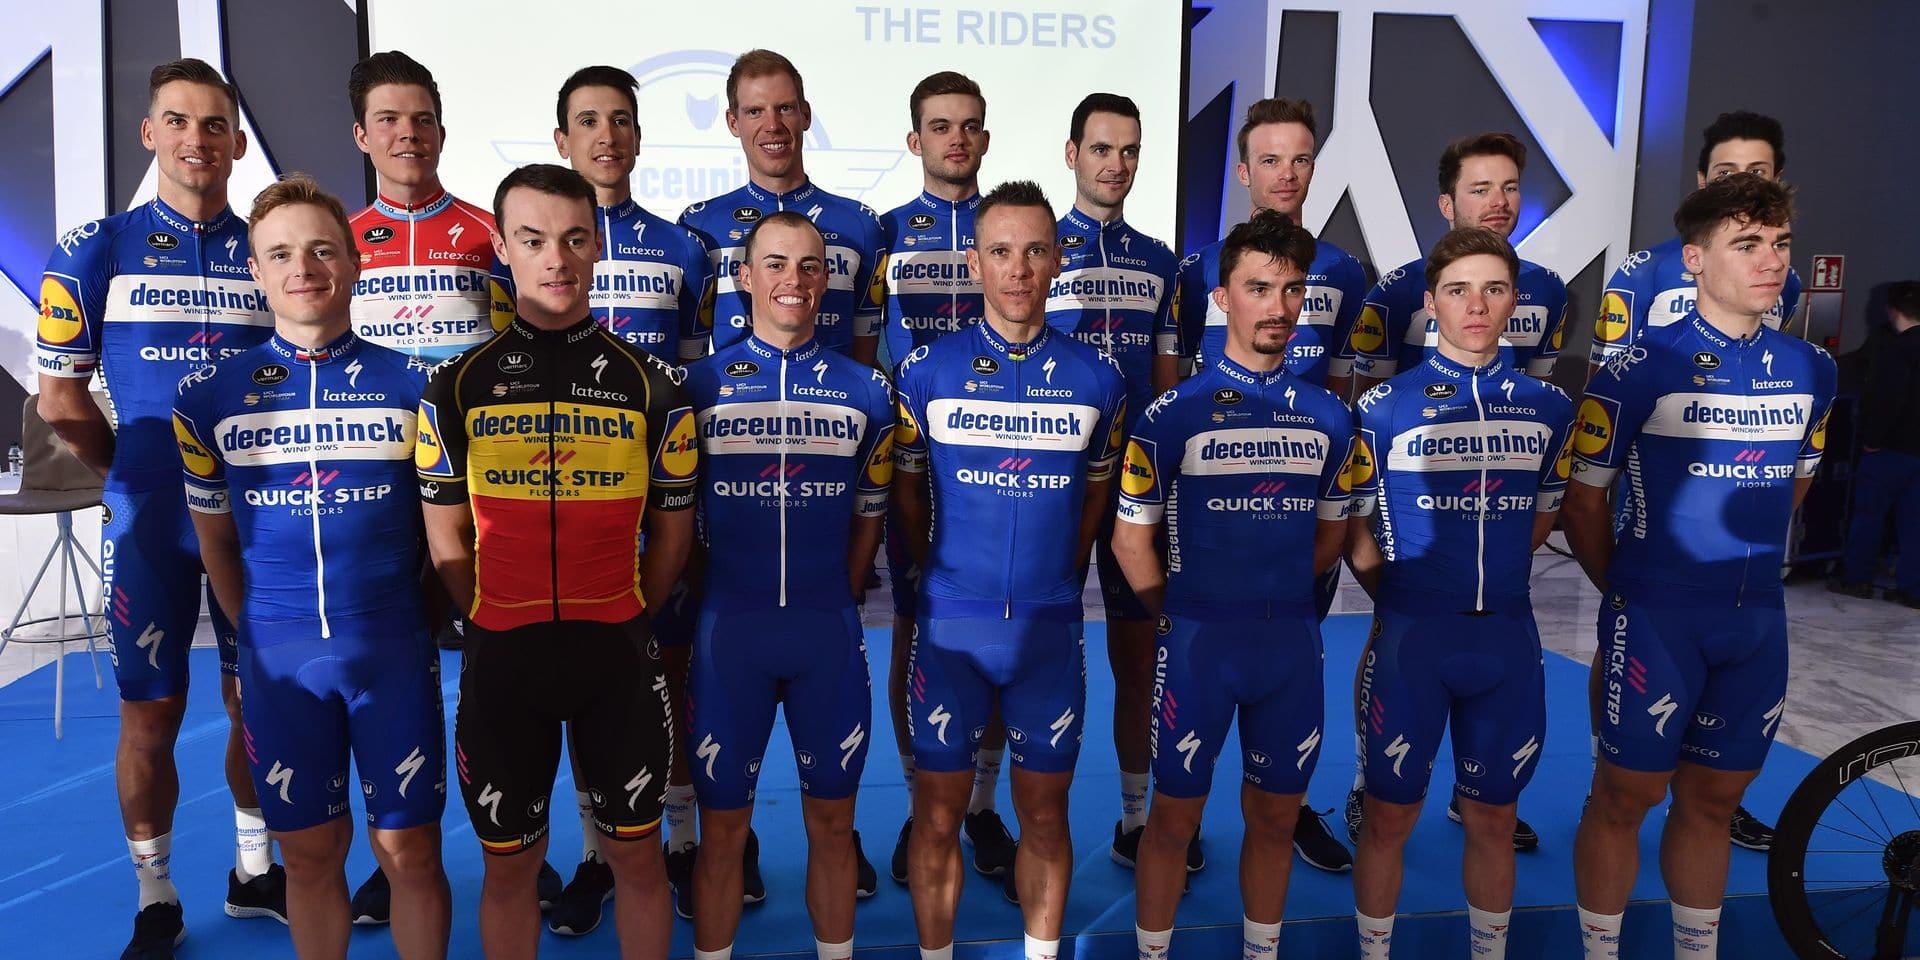 The team pose at the team presentation of Belgian cycling team Deceuninck - Quick-Step, in Calpe, Spain, Tuesday 08 January 2019. BELGA PHOTO ERIC LALMAND